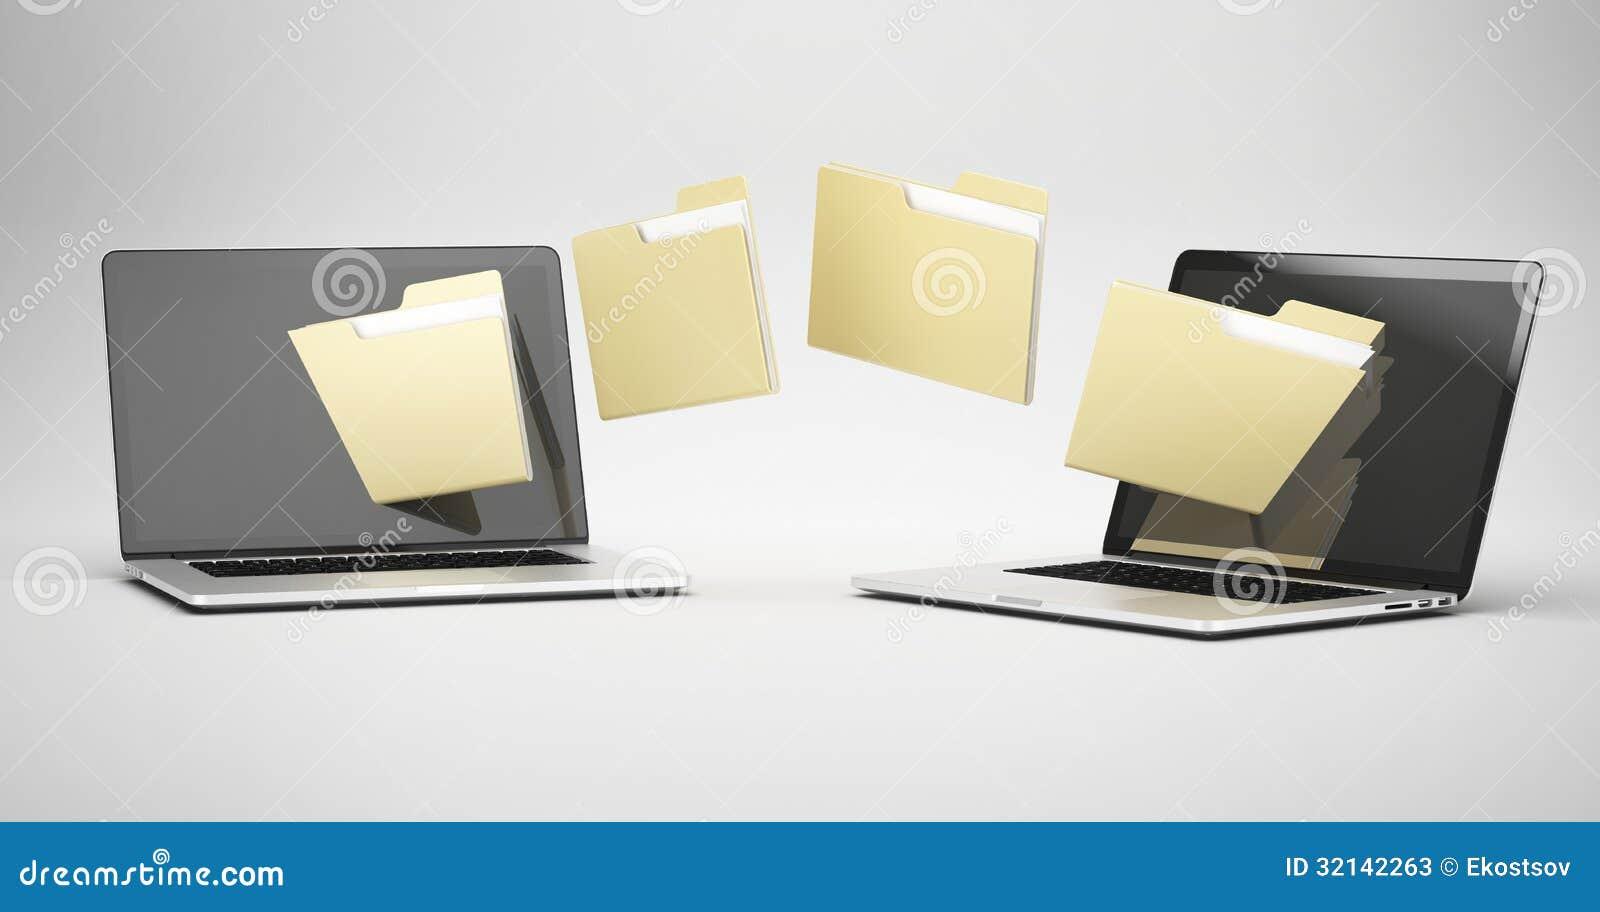 Transferring between two laptops